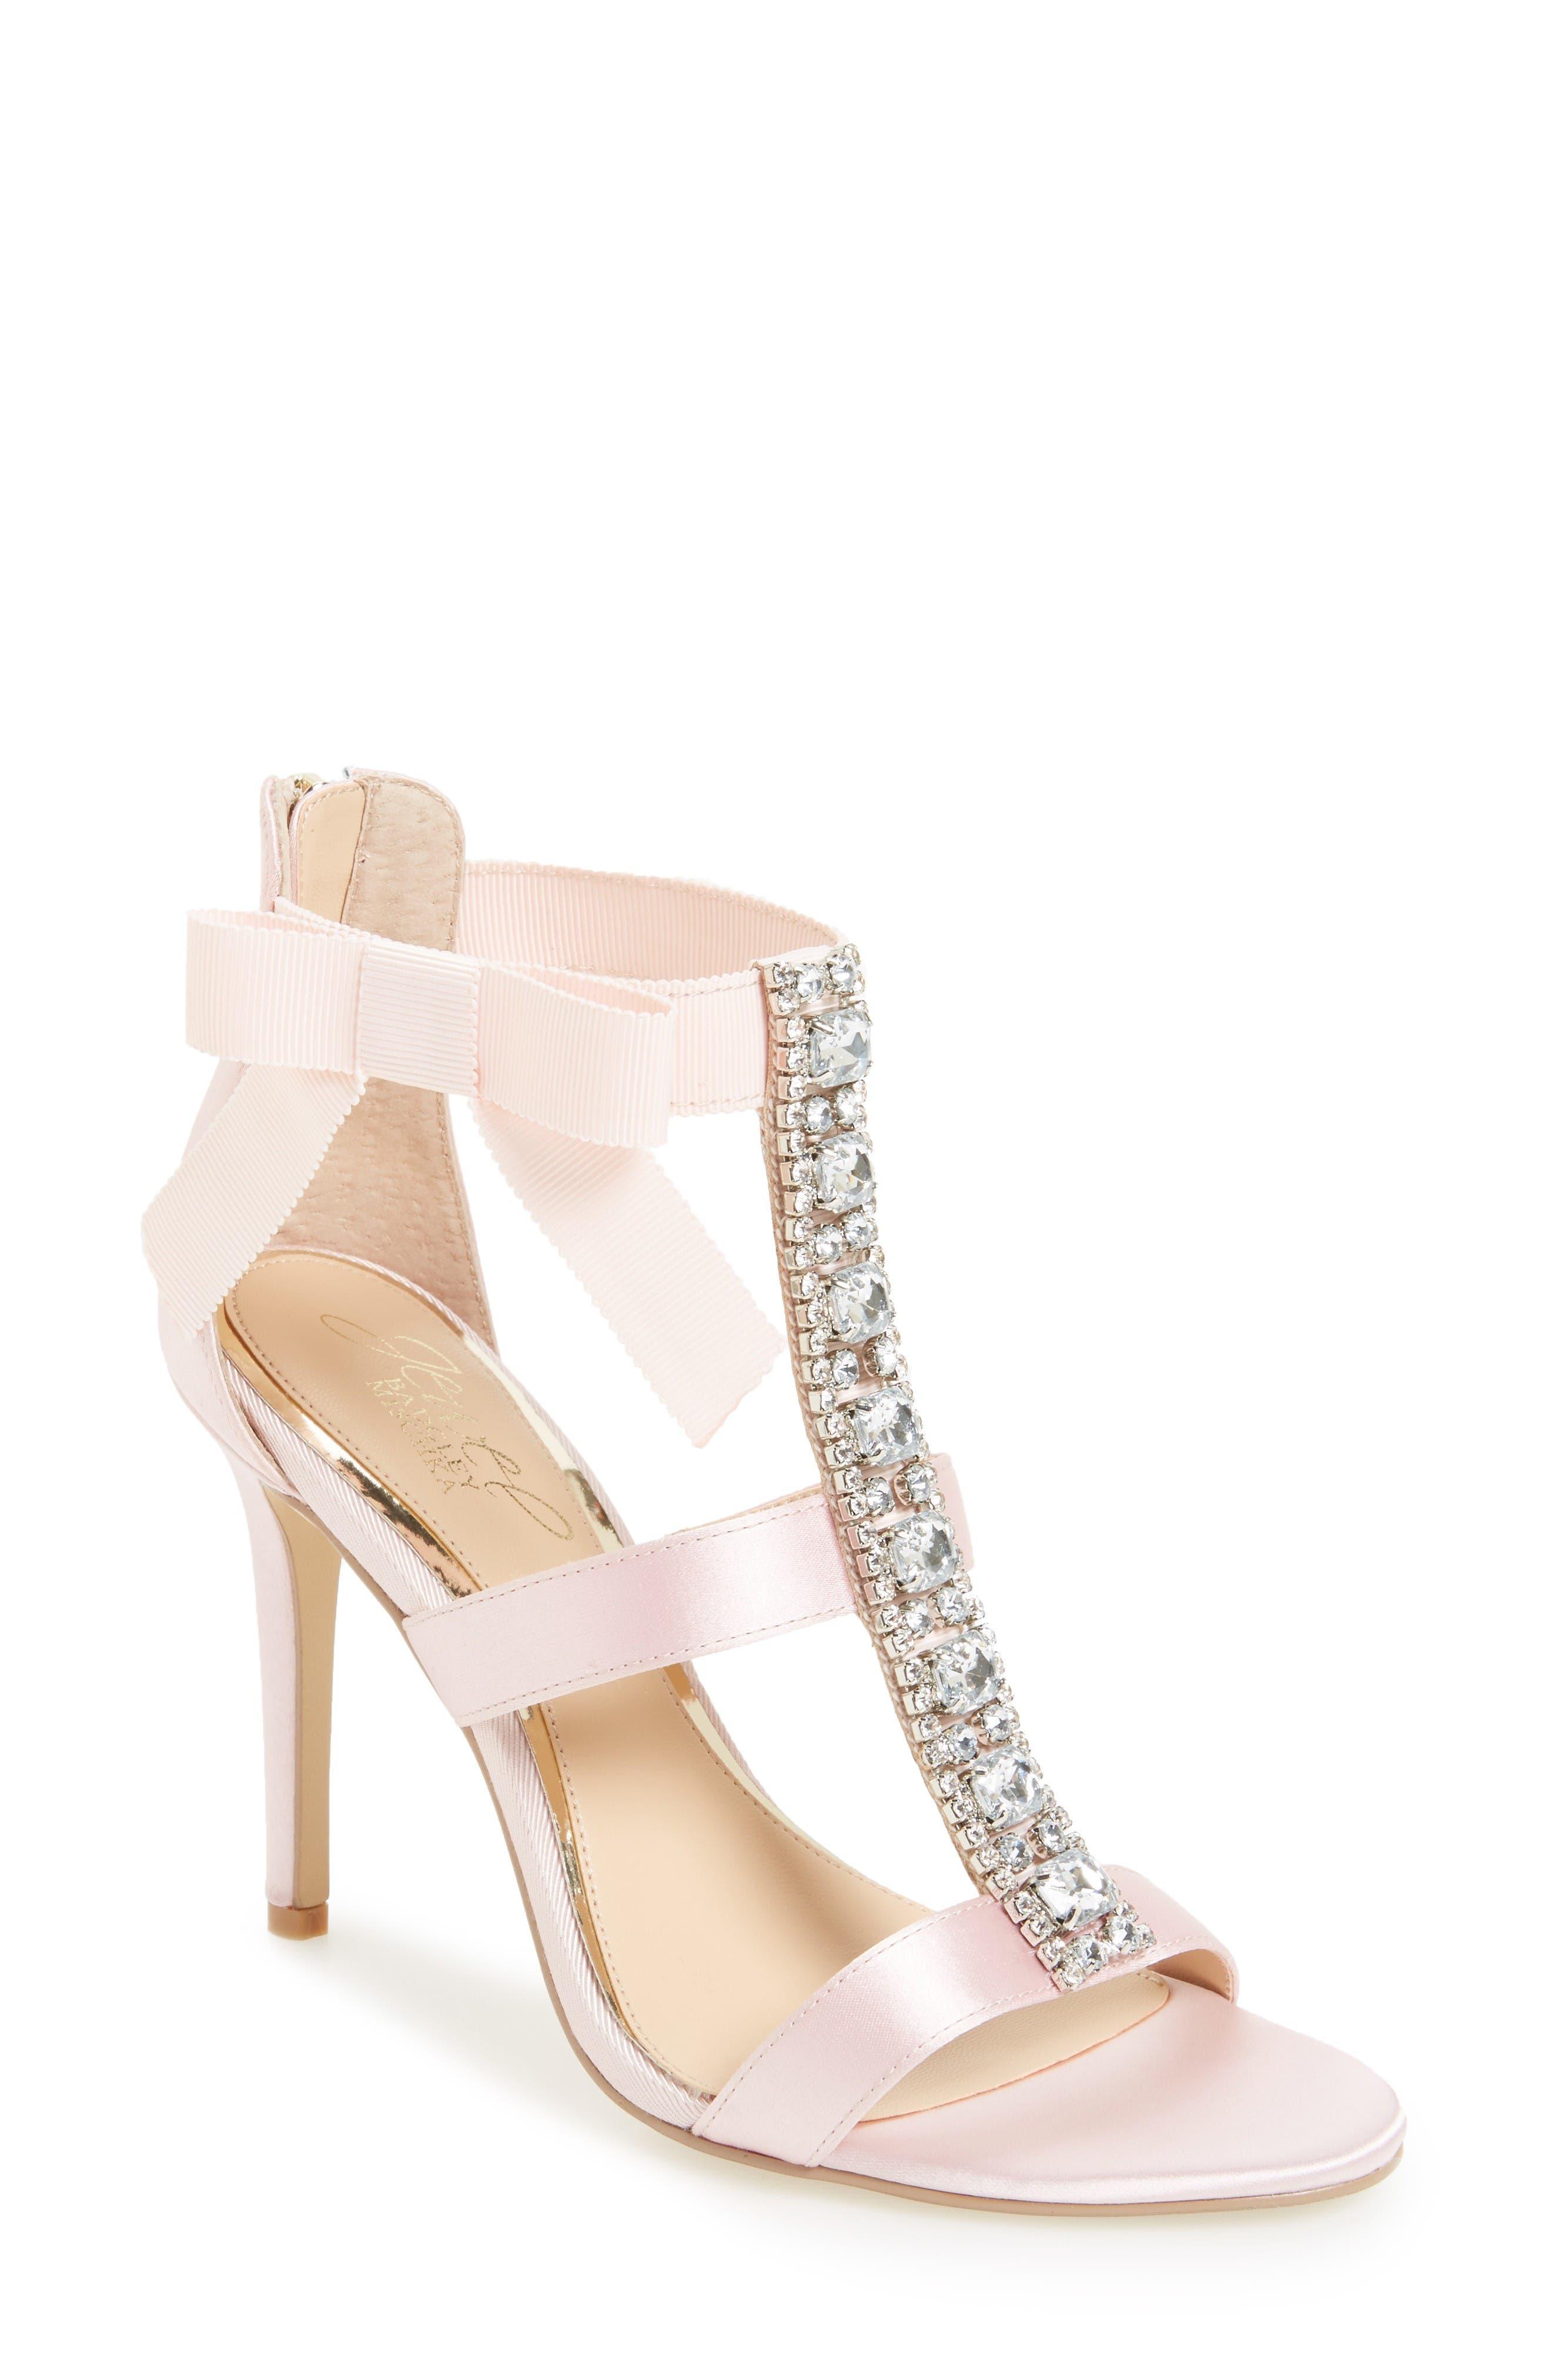 Alternate Image 1 Selected - Jewel Badgley Mischka Henderson Embellished Bow Sandal (Women)